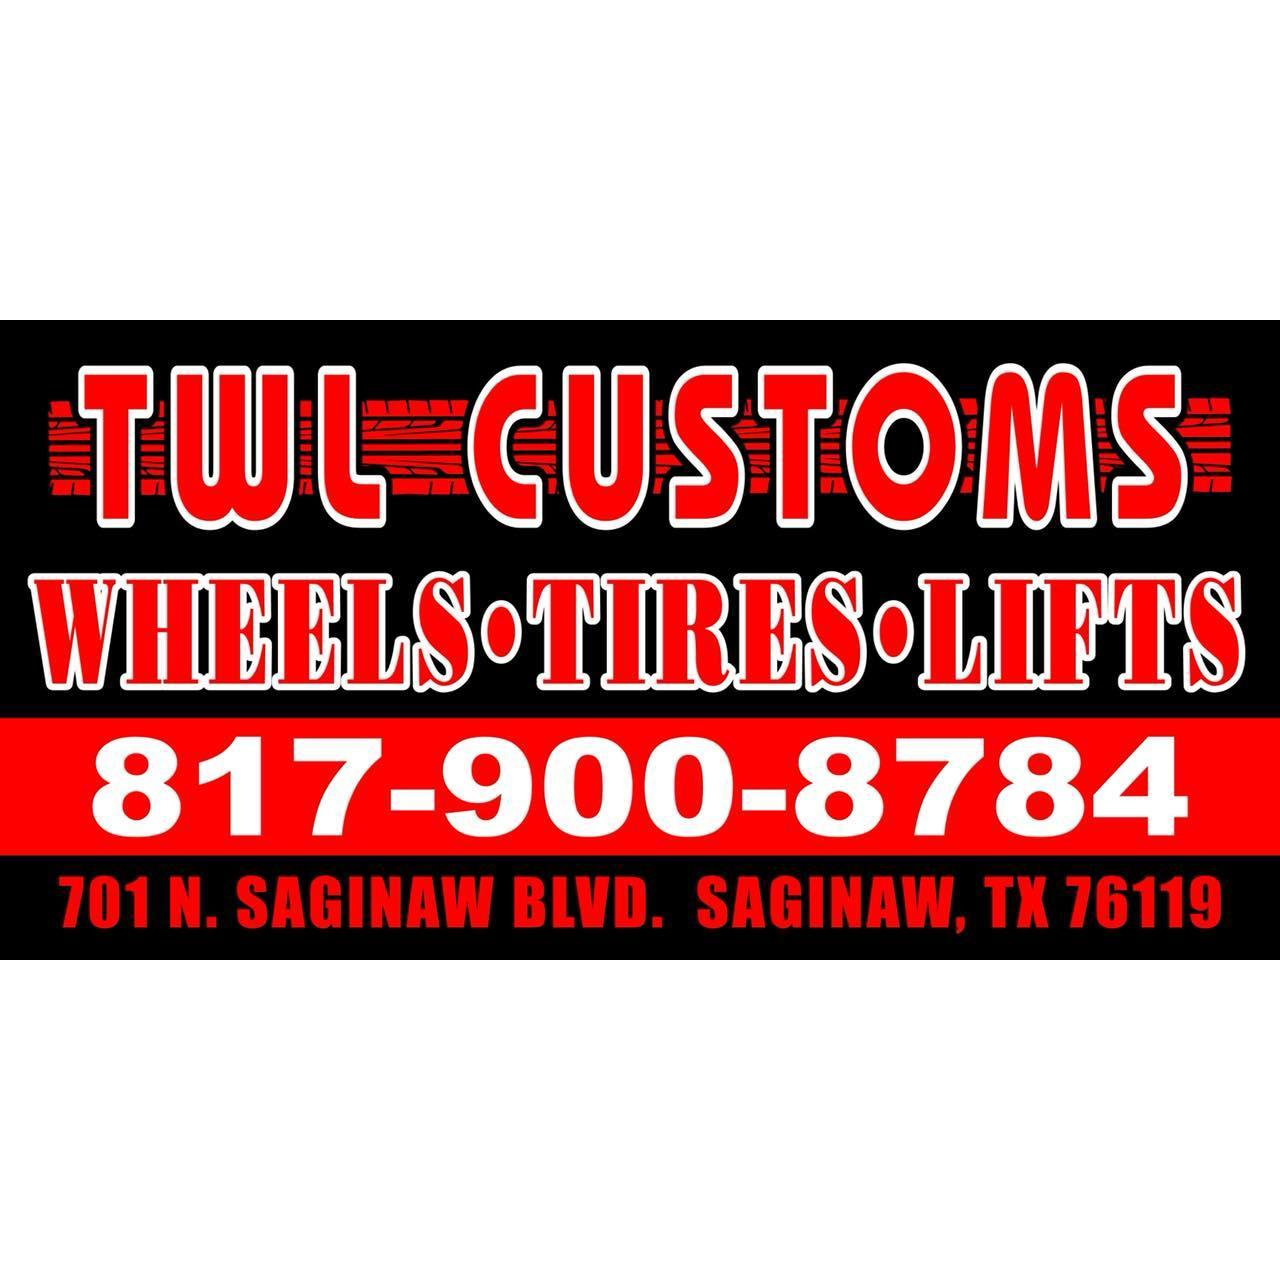 TWL Customs